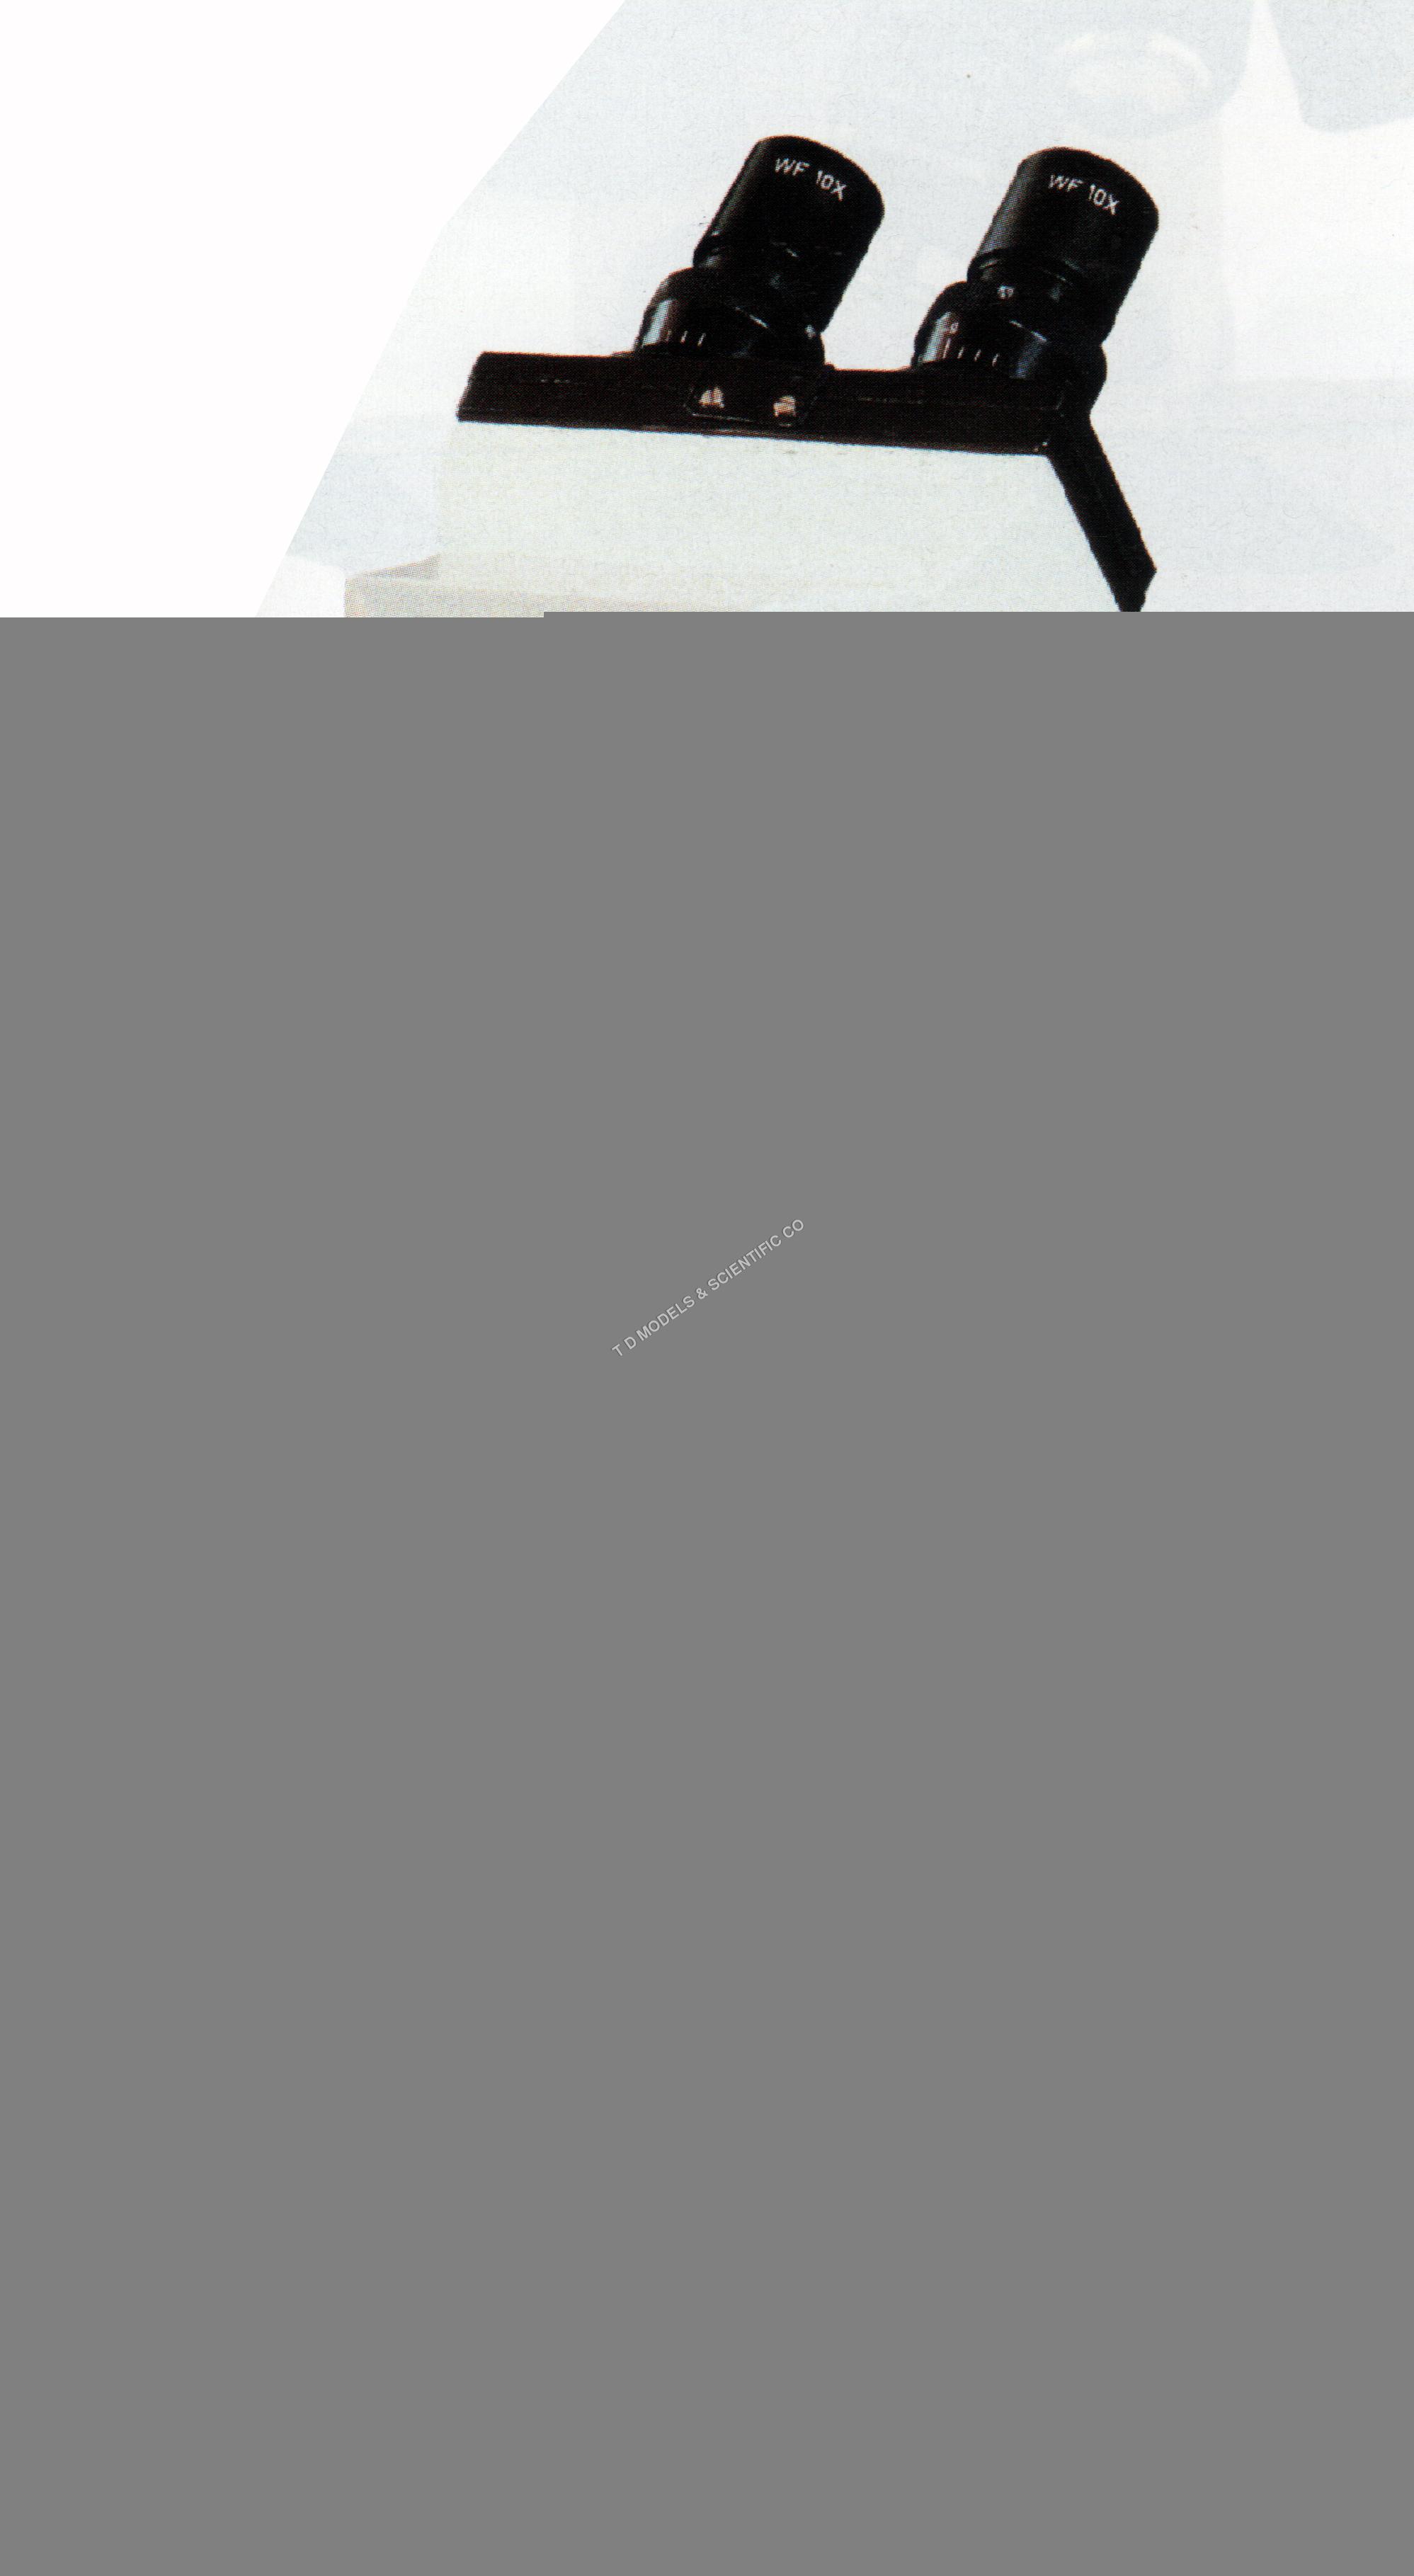 BINOCULAR LABORATORY MICROSCOPE MODEL HL CMS 1000